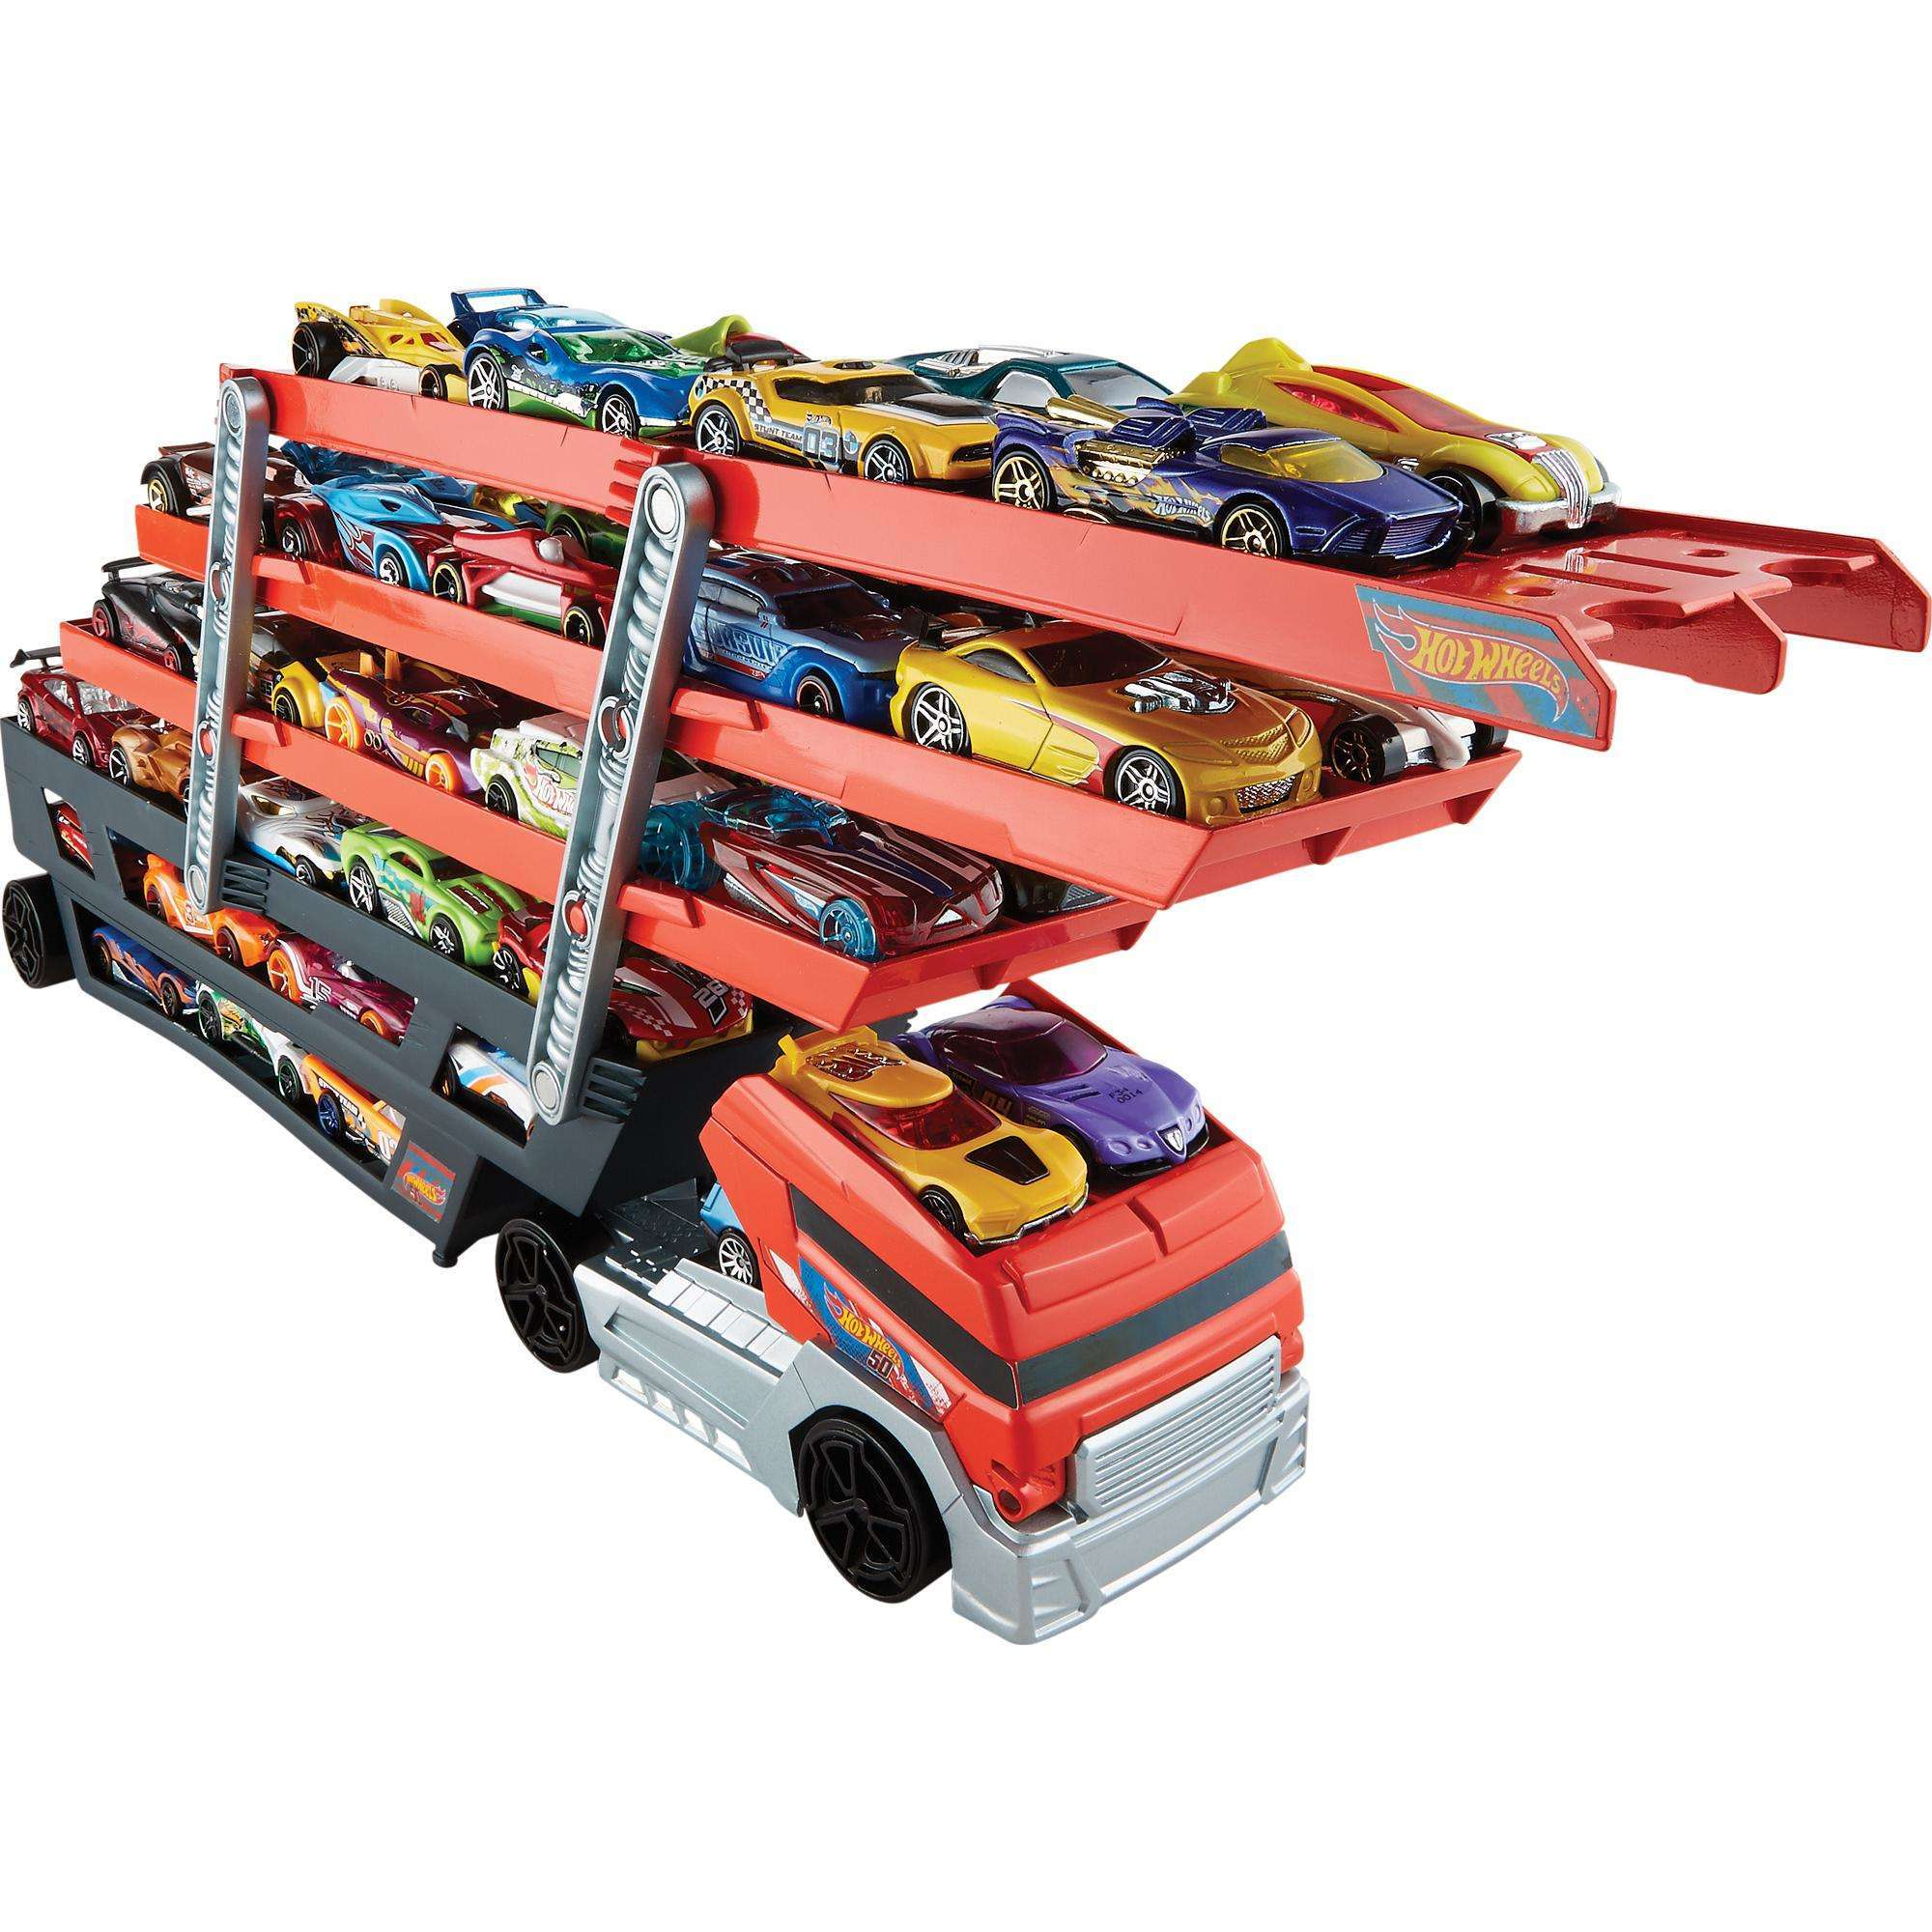 Hot Wheels Mega Hauler Truck by Mattel